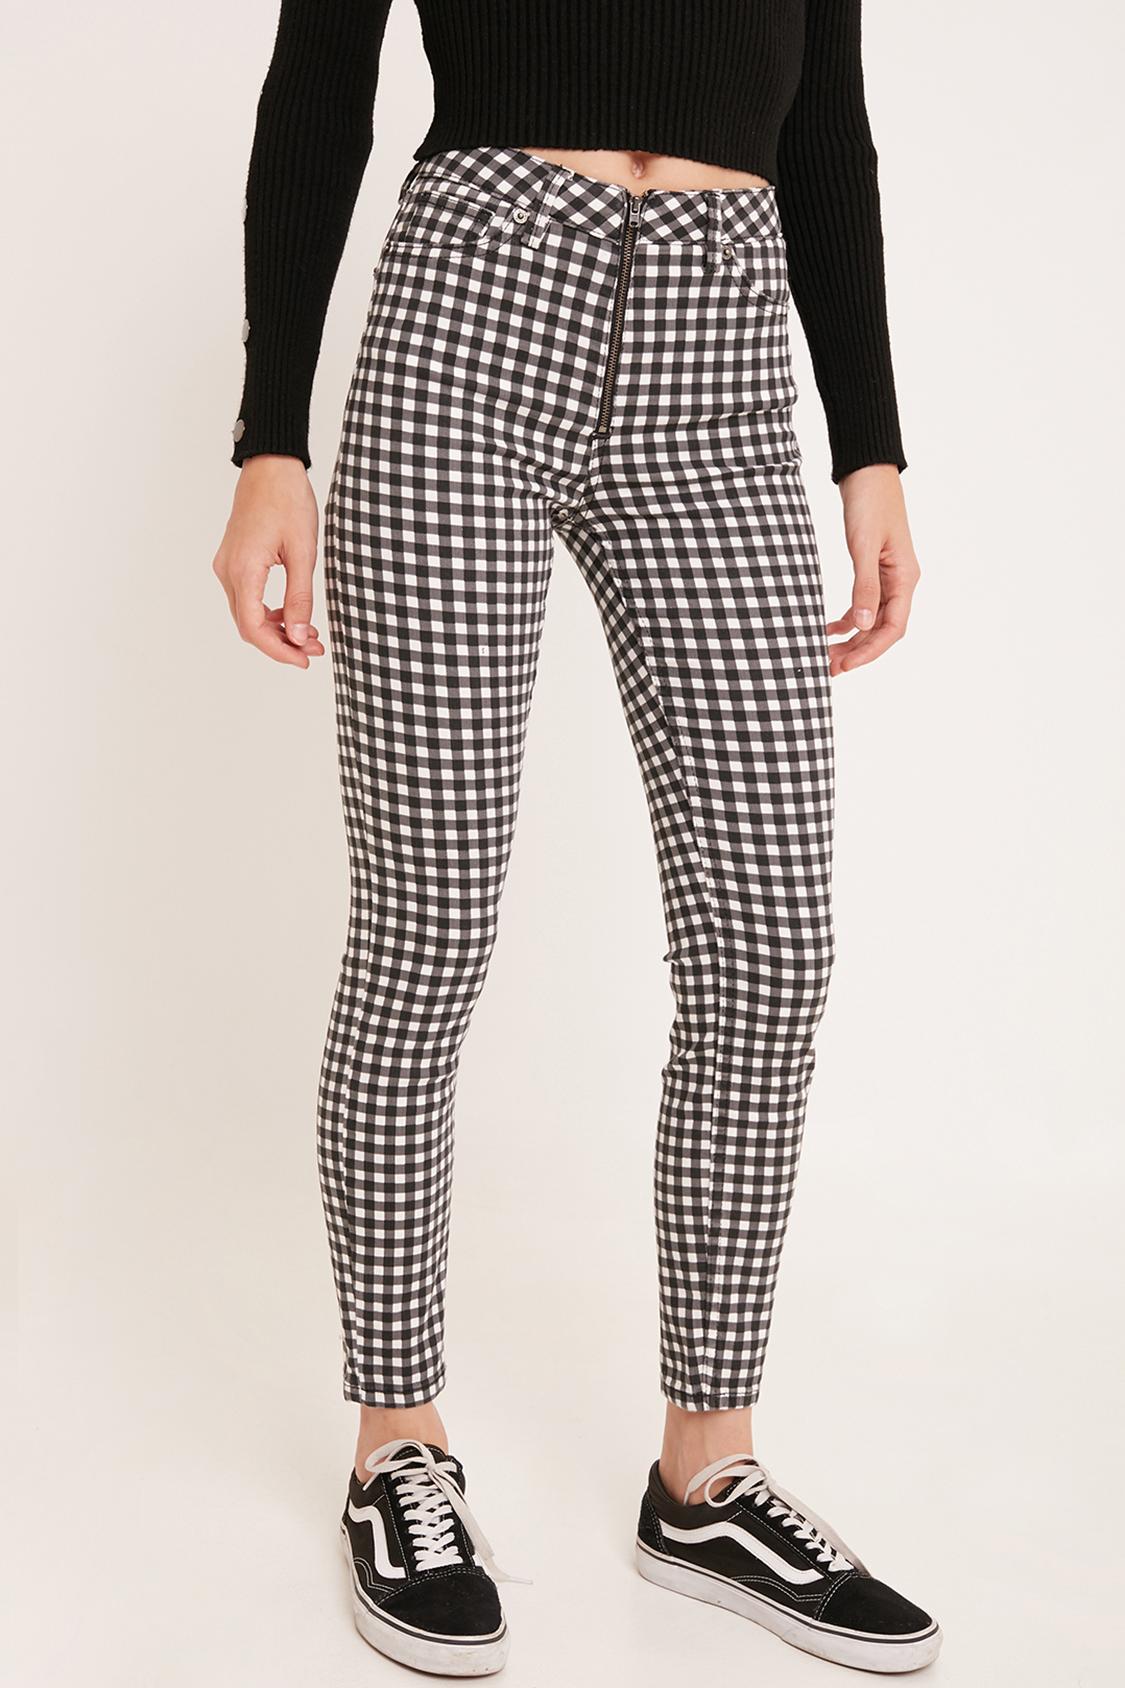 Pantaloni a quadri vichy